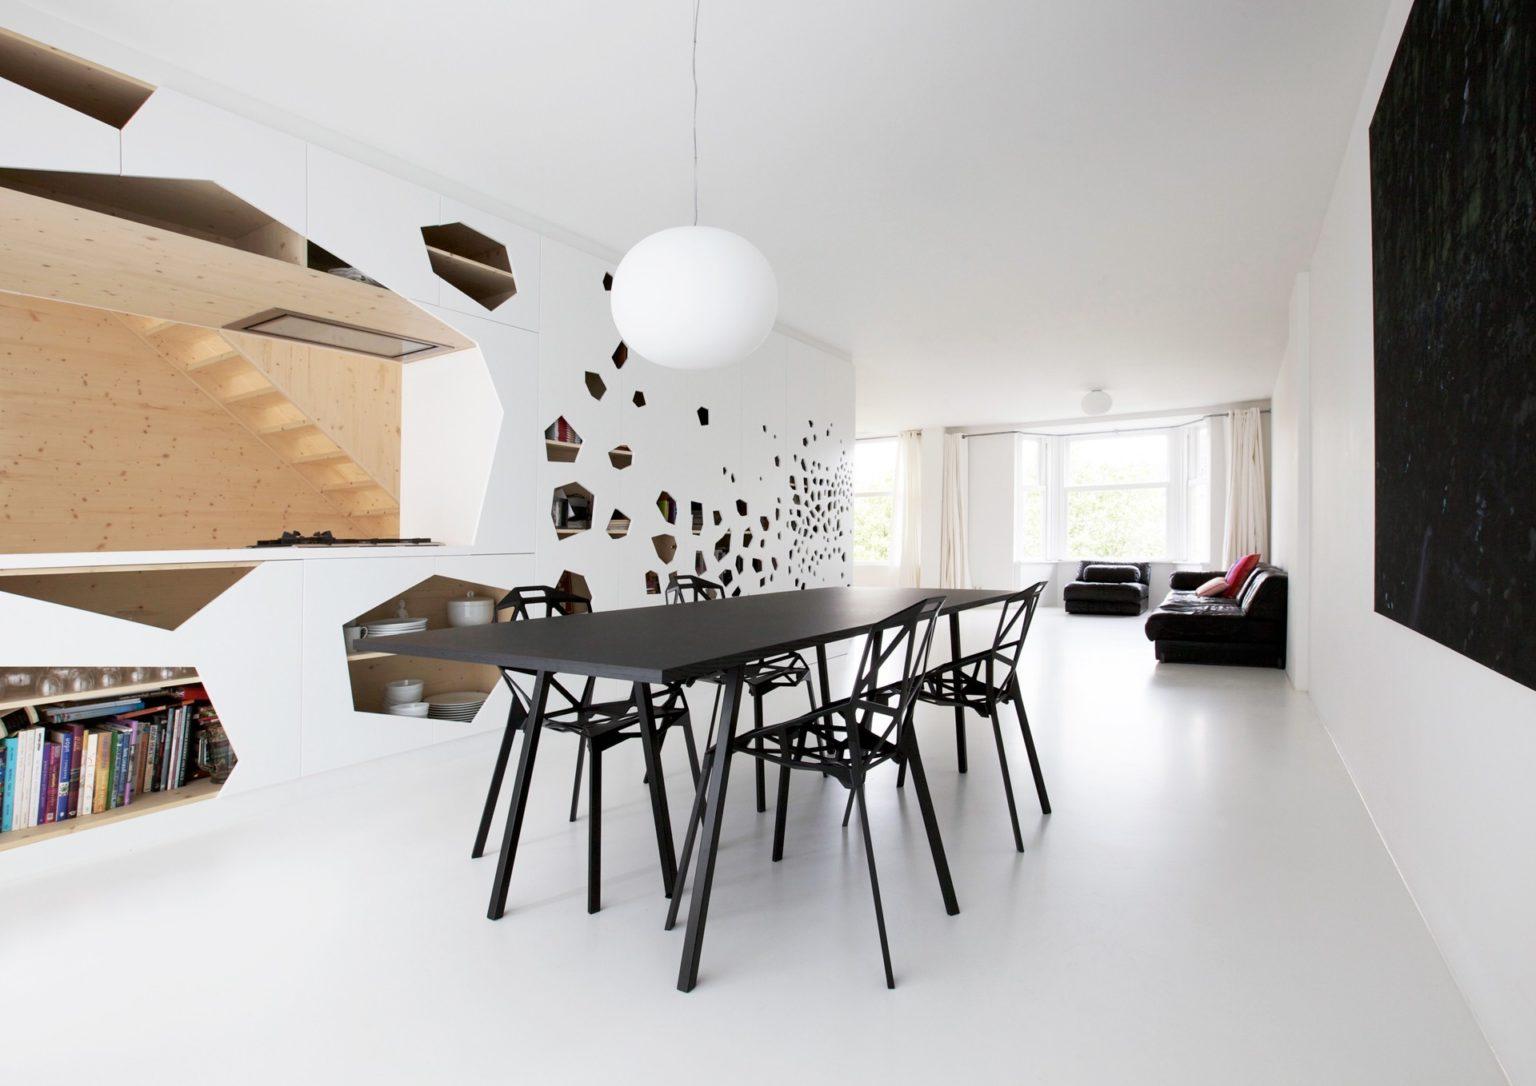 Gietvloer keuken, living, interieur, vloeren